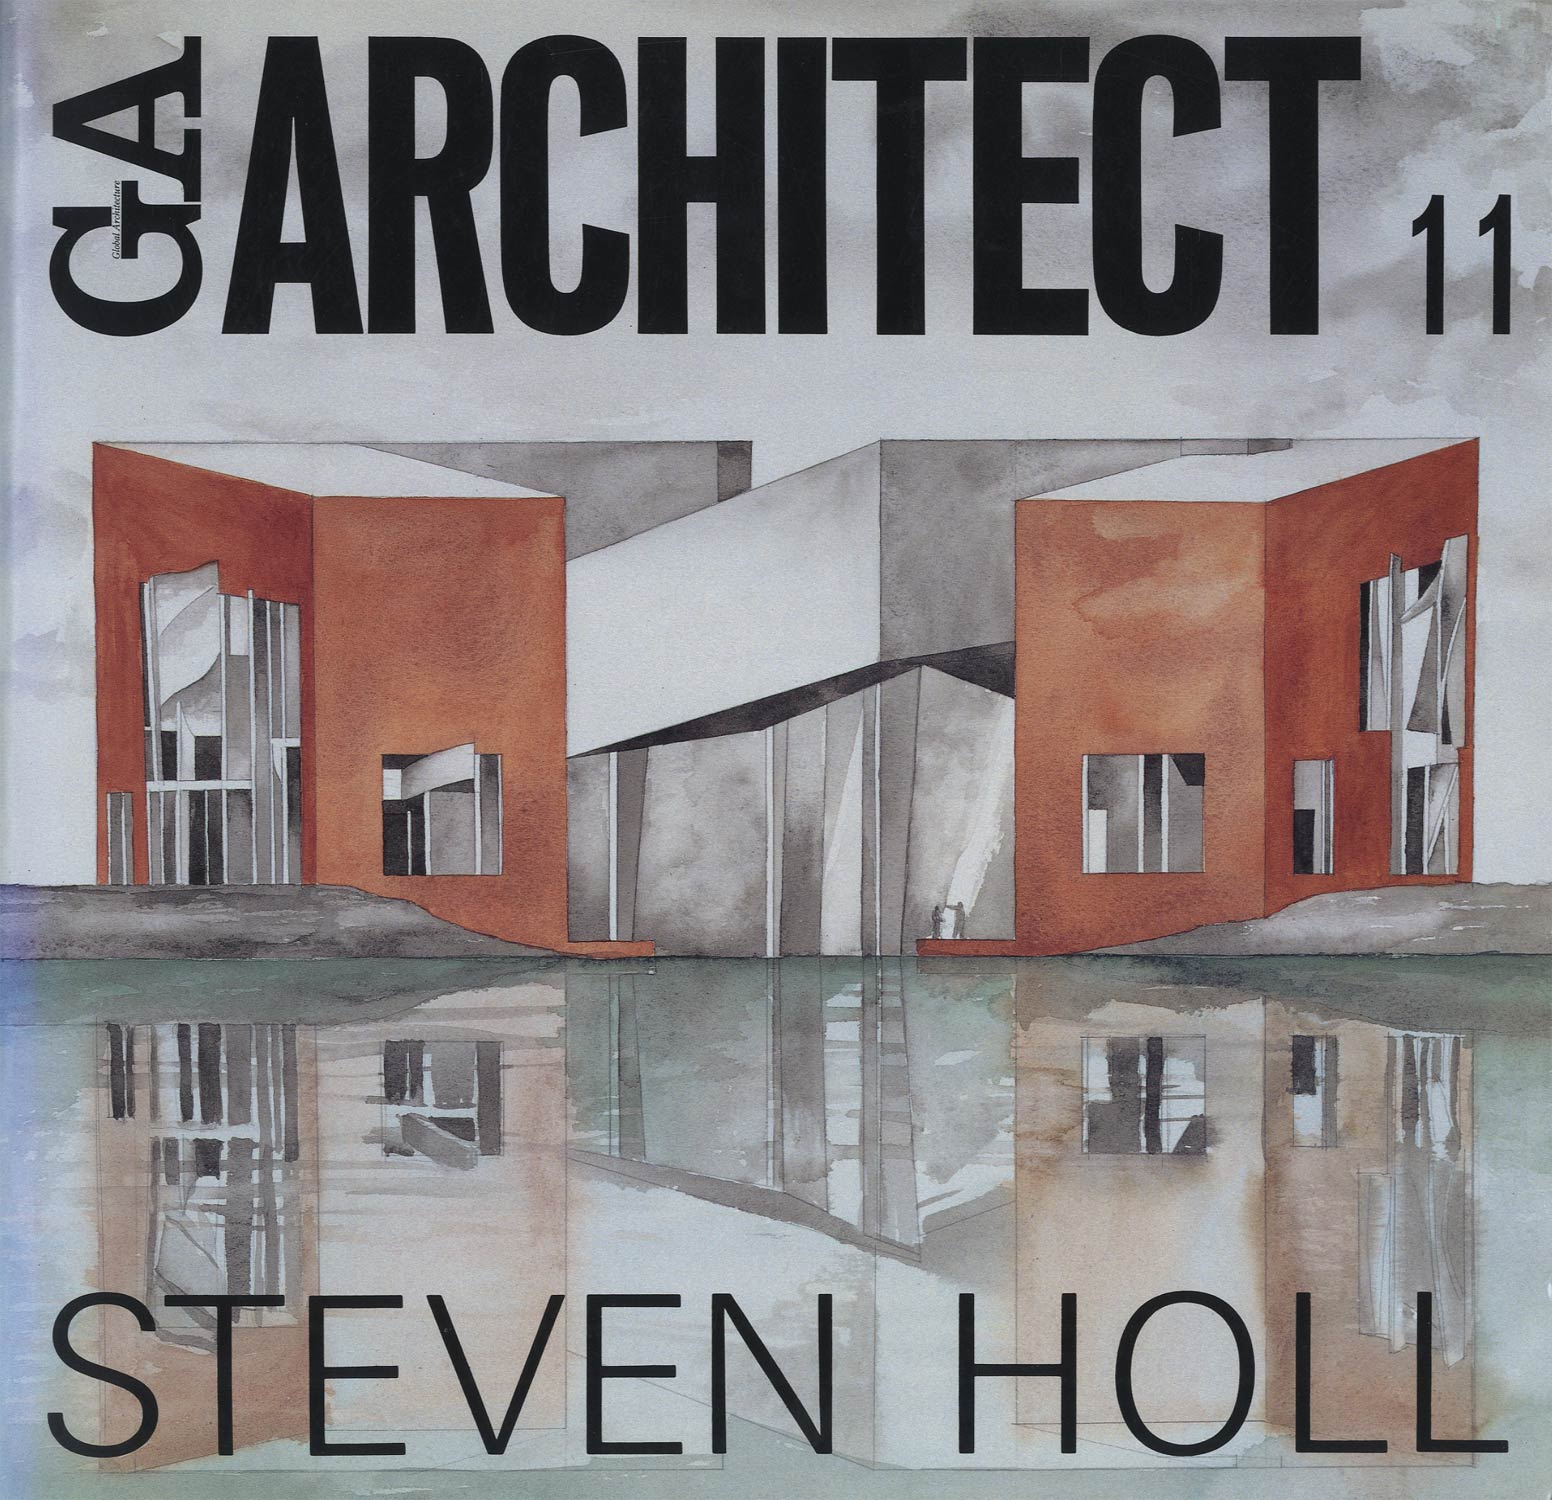 GA ARCHITECT 世界の建築家 11/STEVEN HOLL スティーヴン・ホール